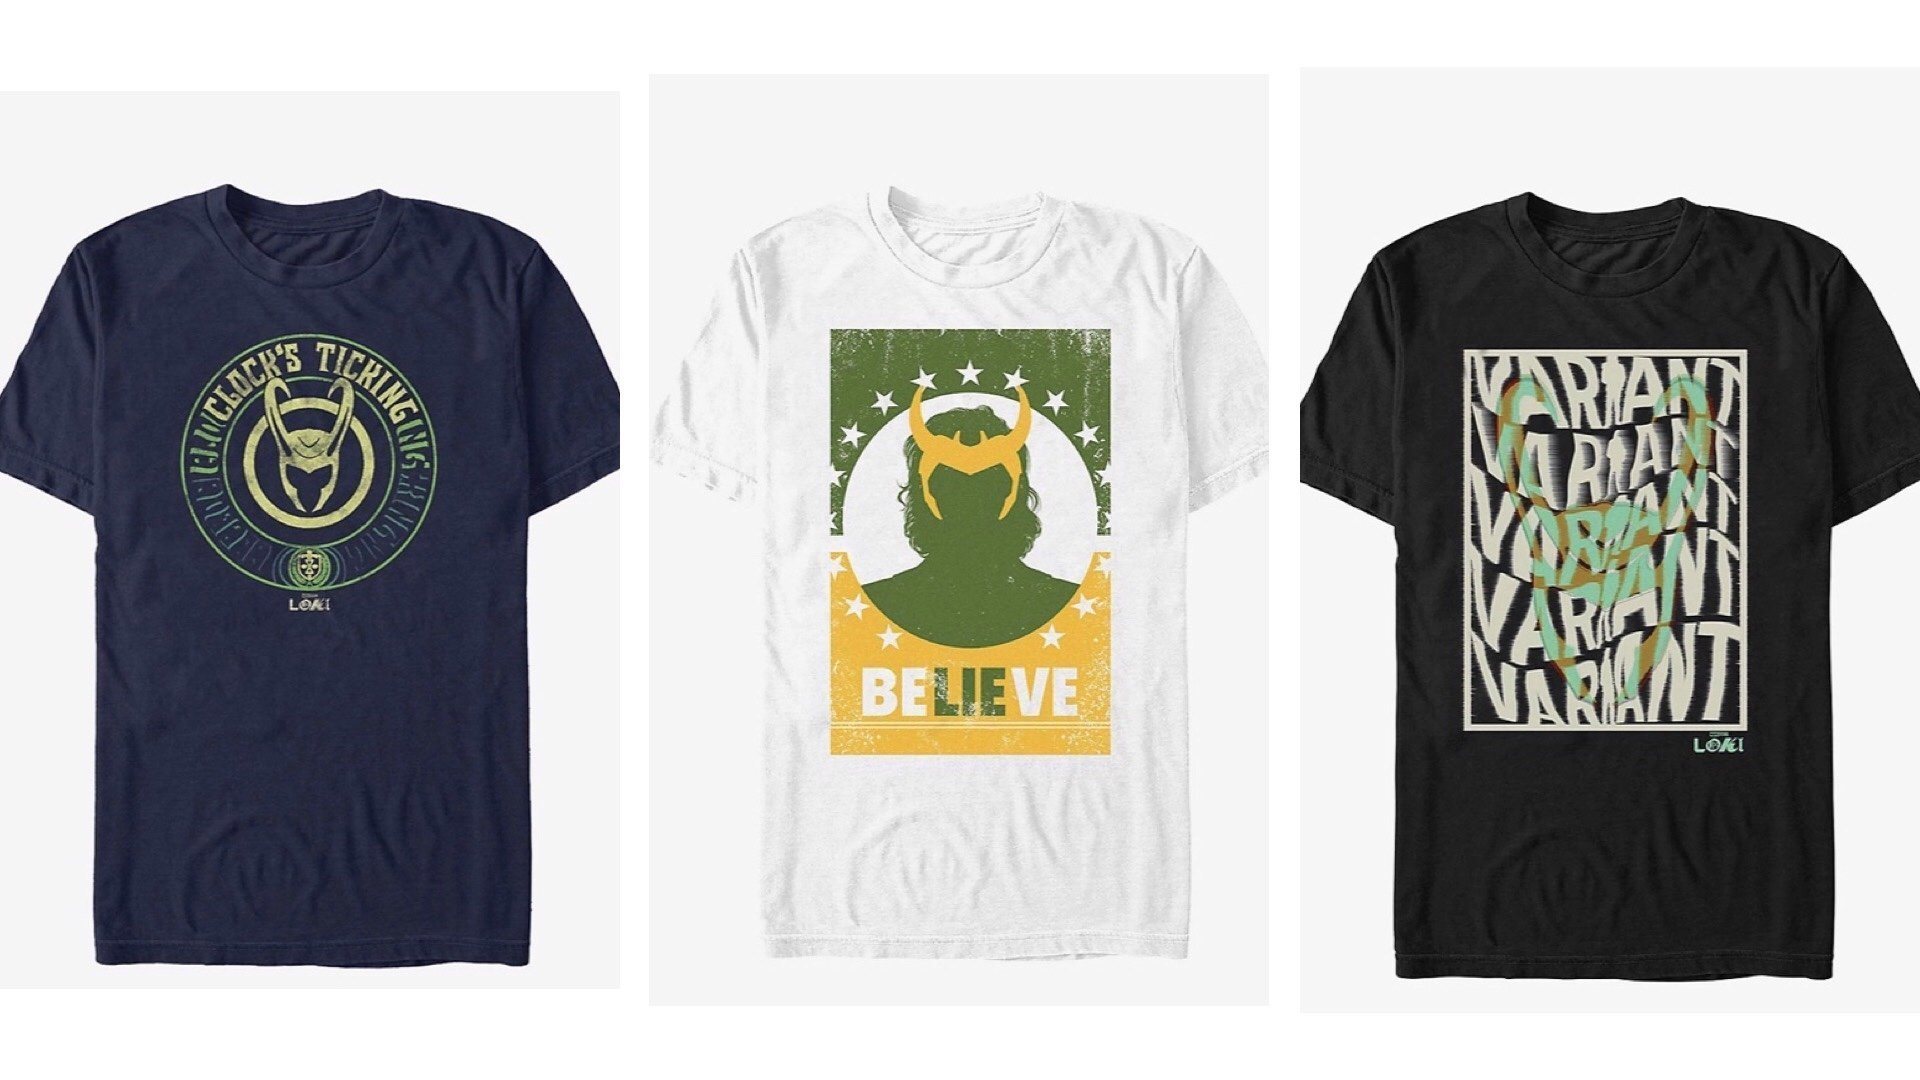 Loki merchandise